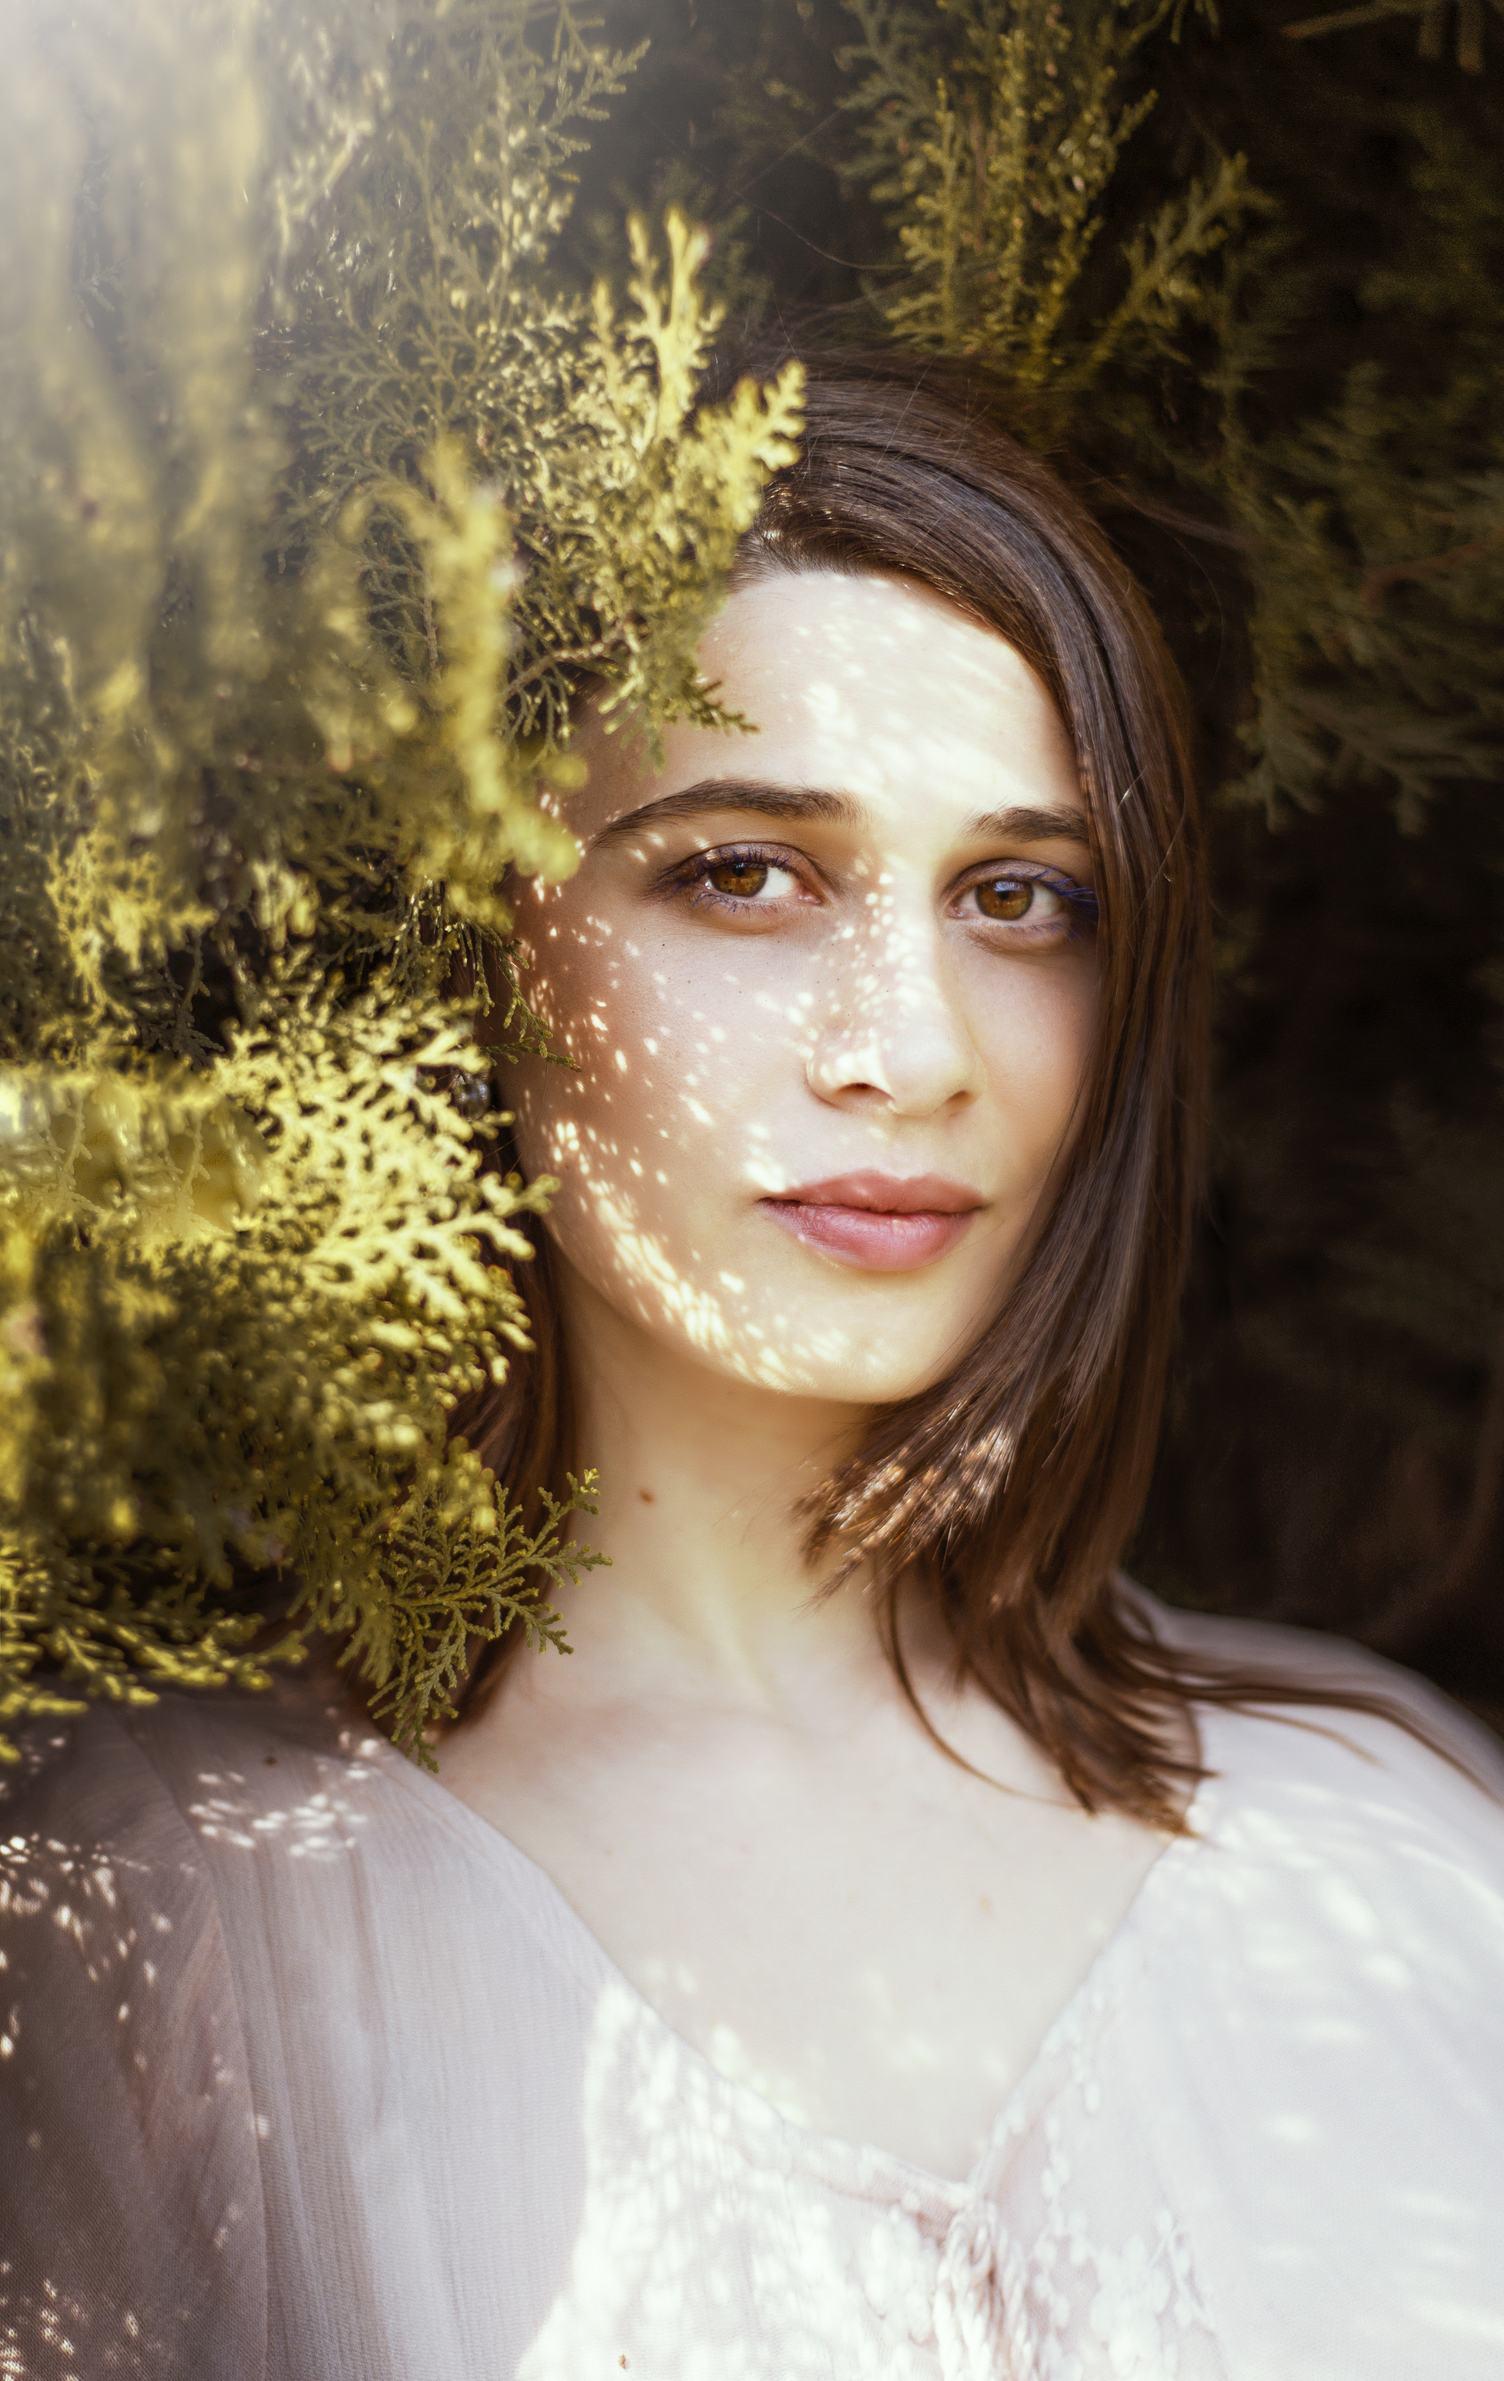 Close Up Portrait of a Beautiful Brunette Woman